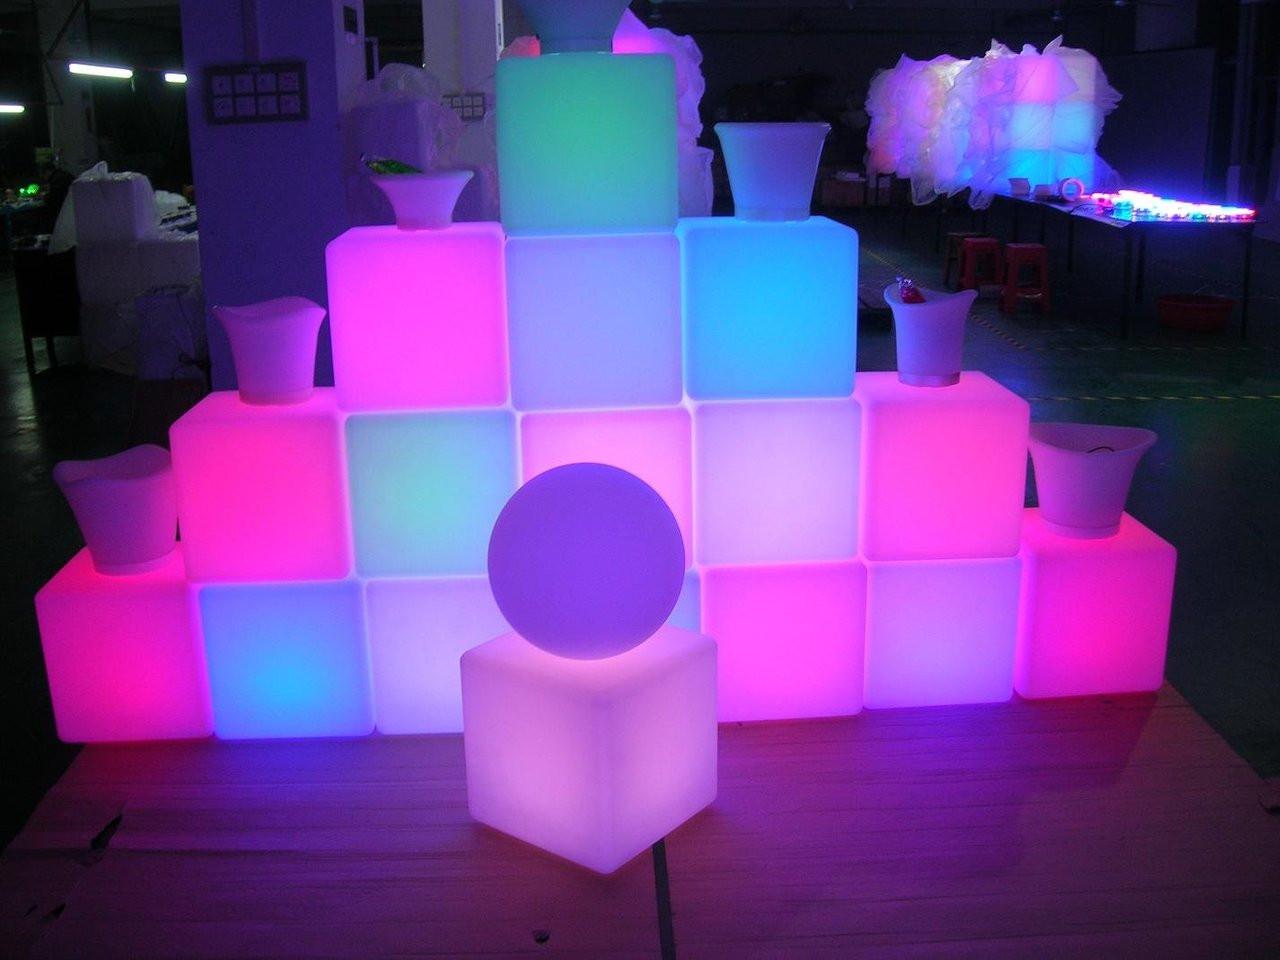 LED, CUBE, FURNITURE, GLOW, Glow Furniture, Nightclub furniture